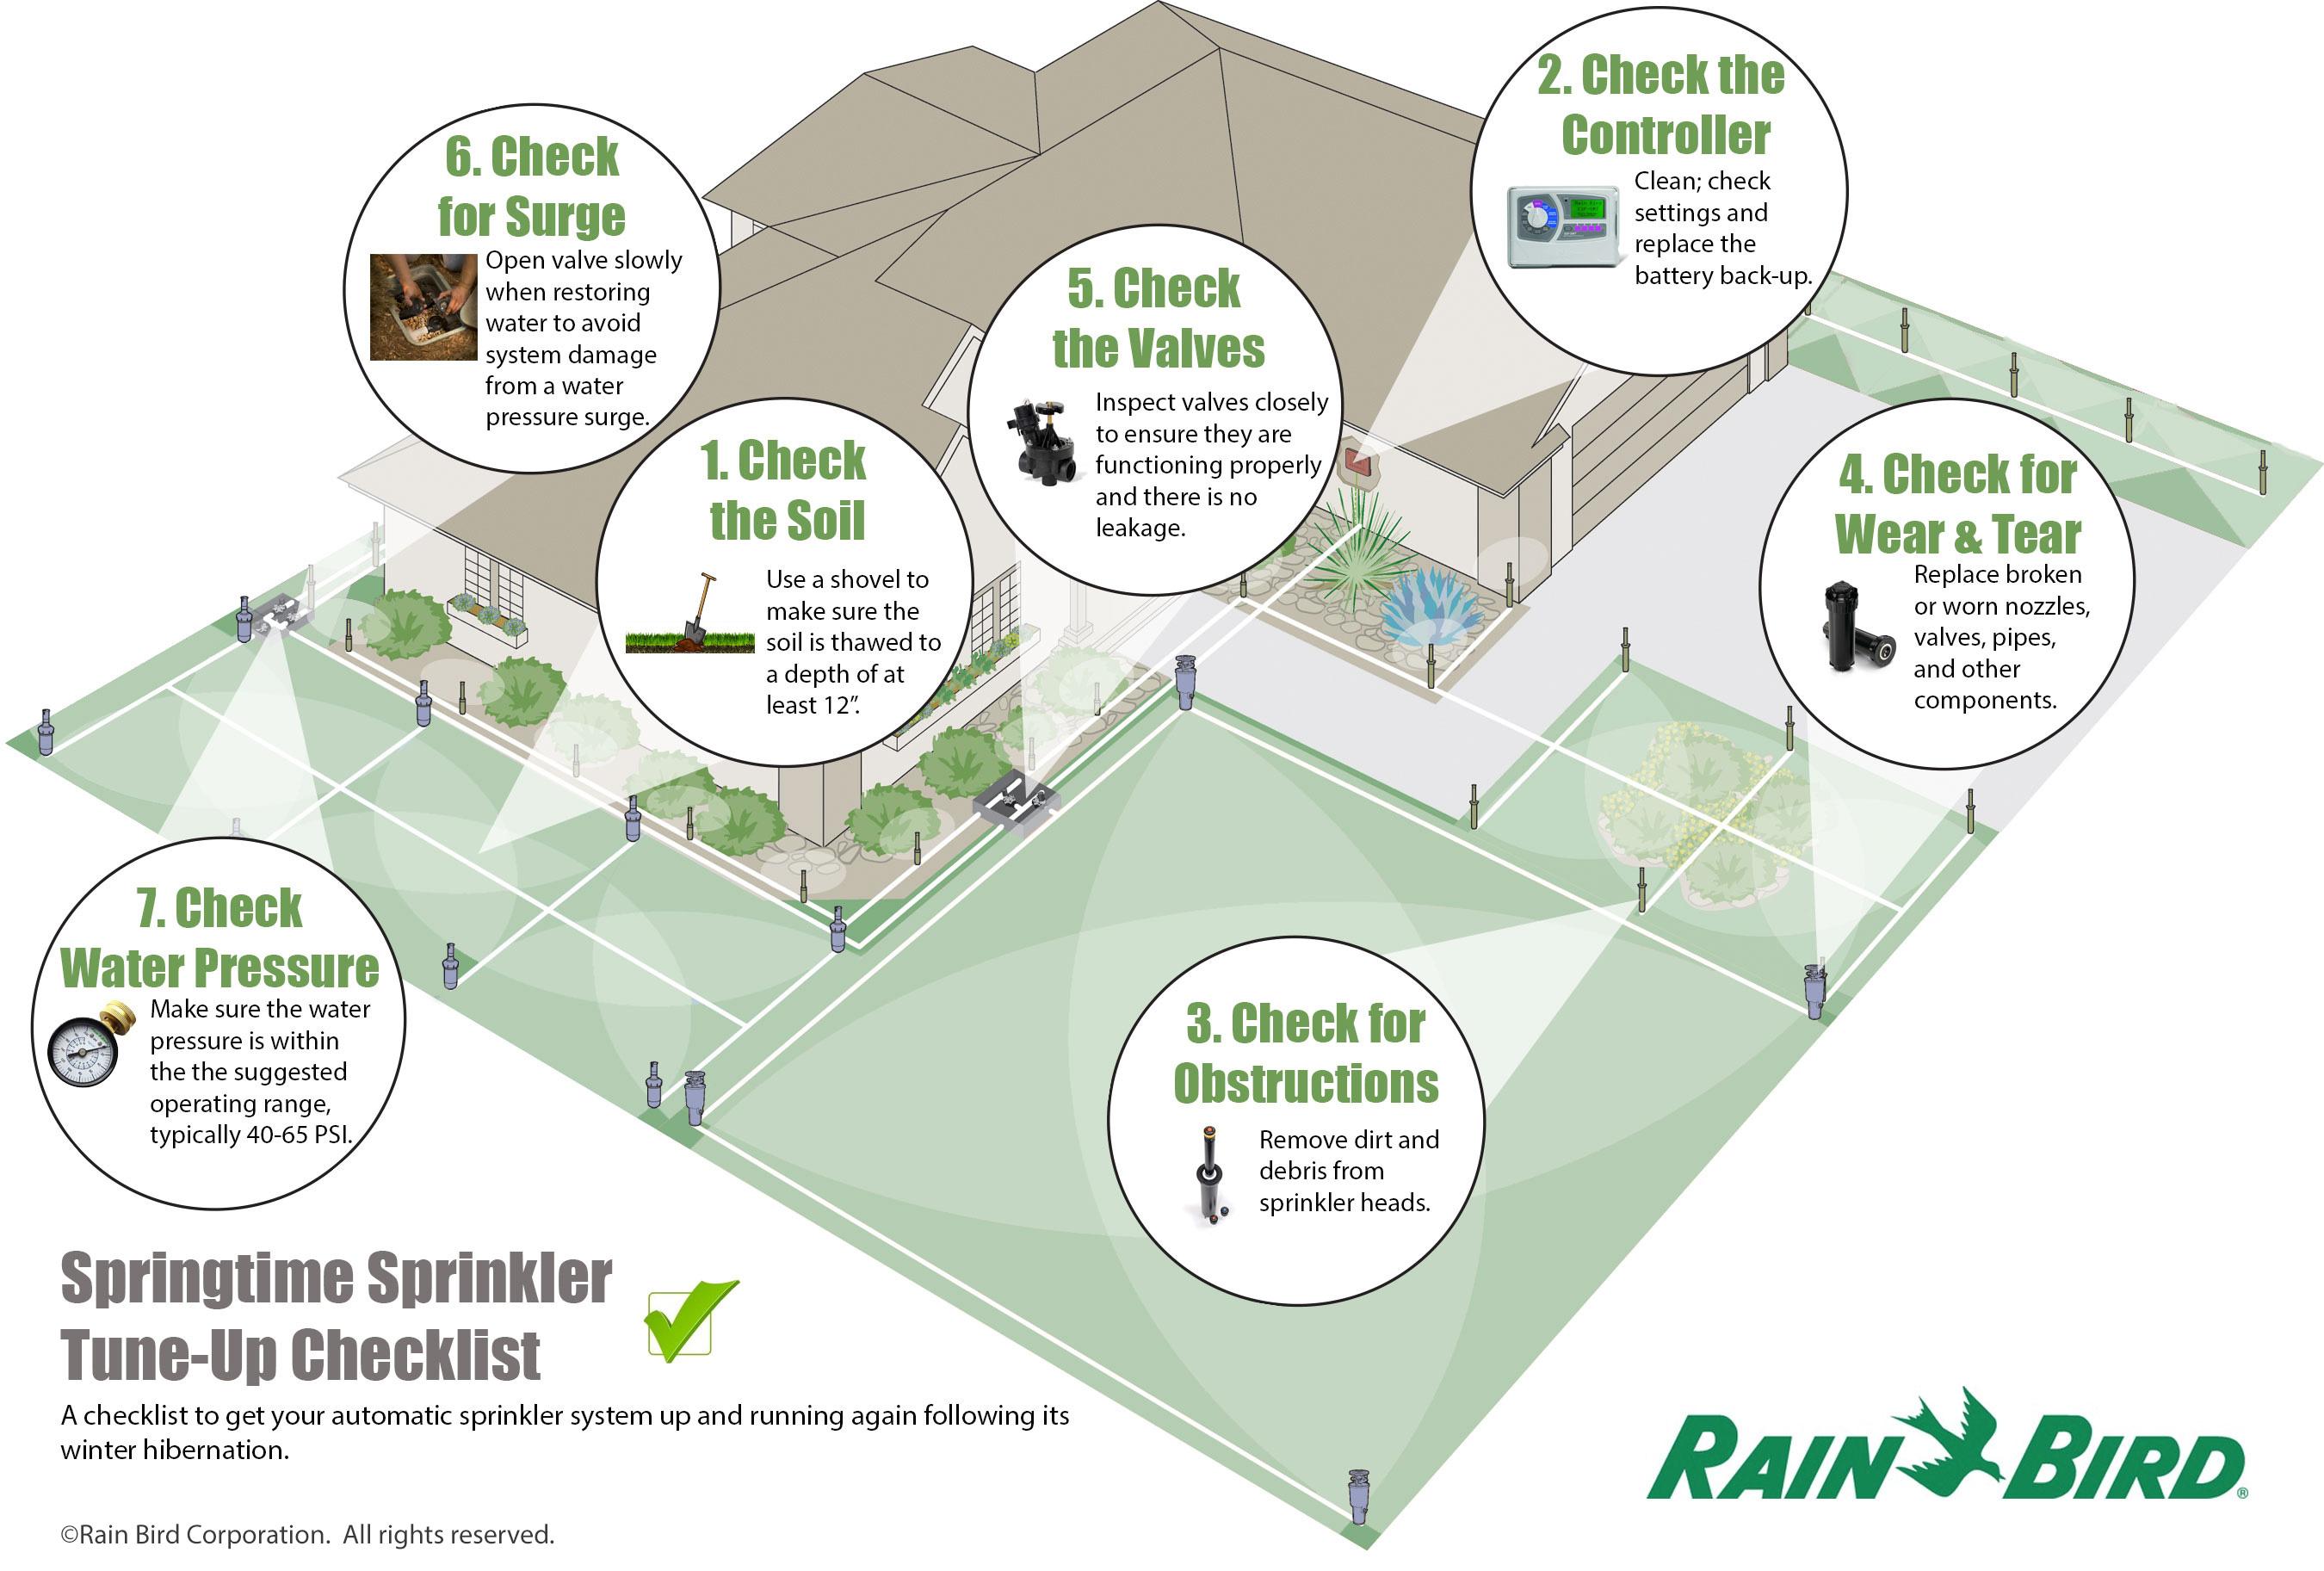 get your sprinkler system ready for spring and summer